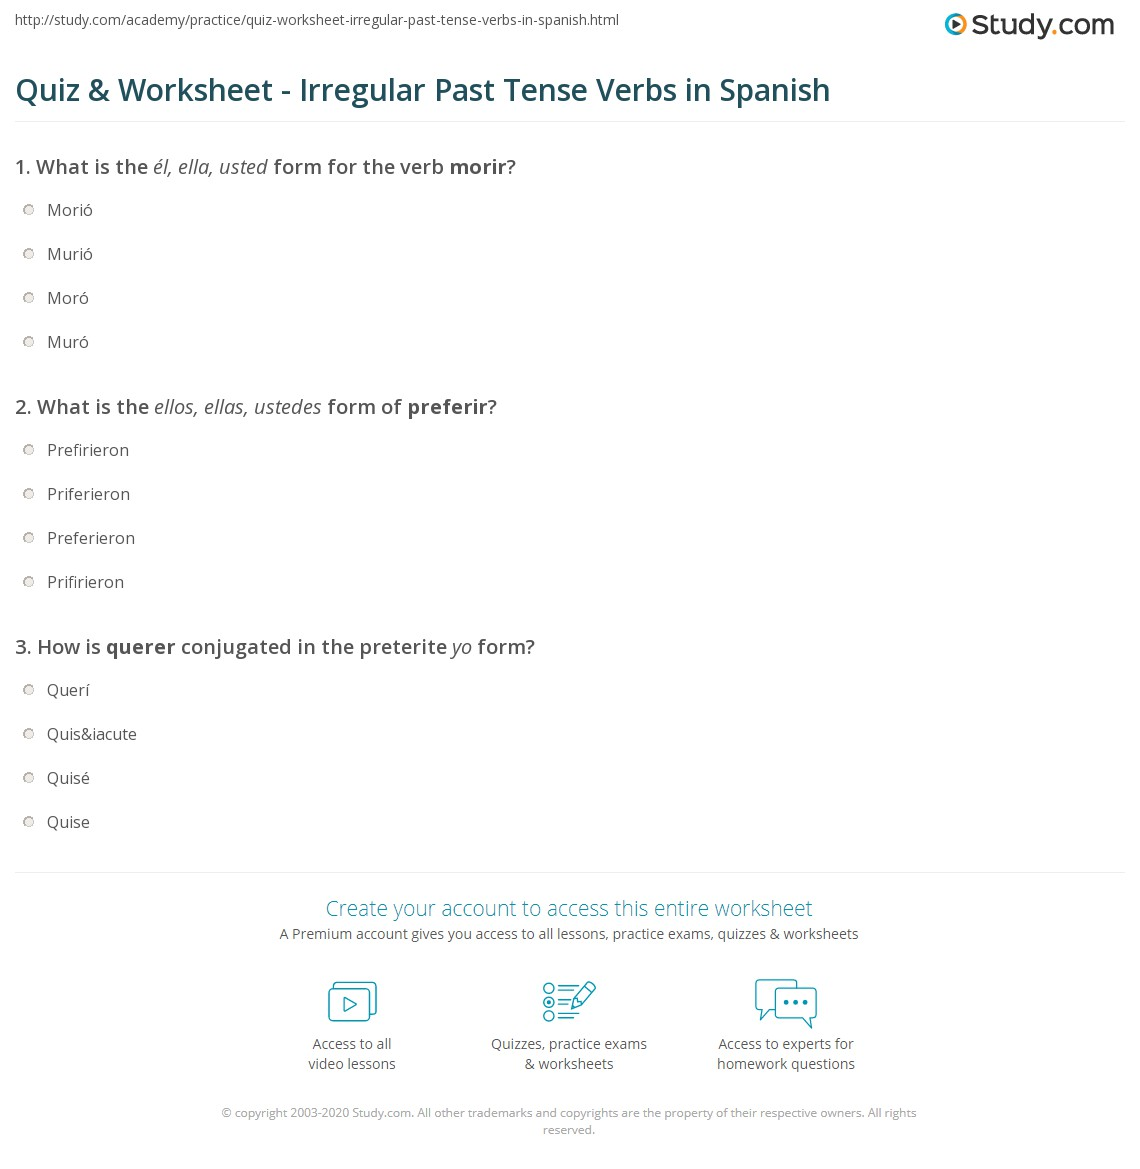 Quiz Worksheet Irregular Past Tense Verbs In Spanish